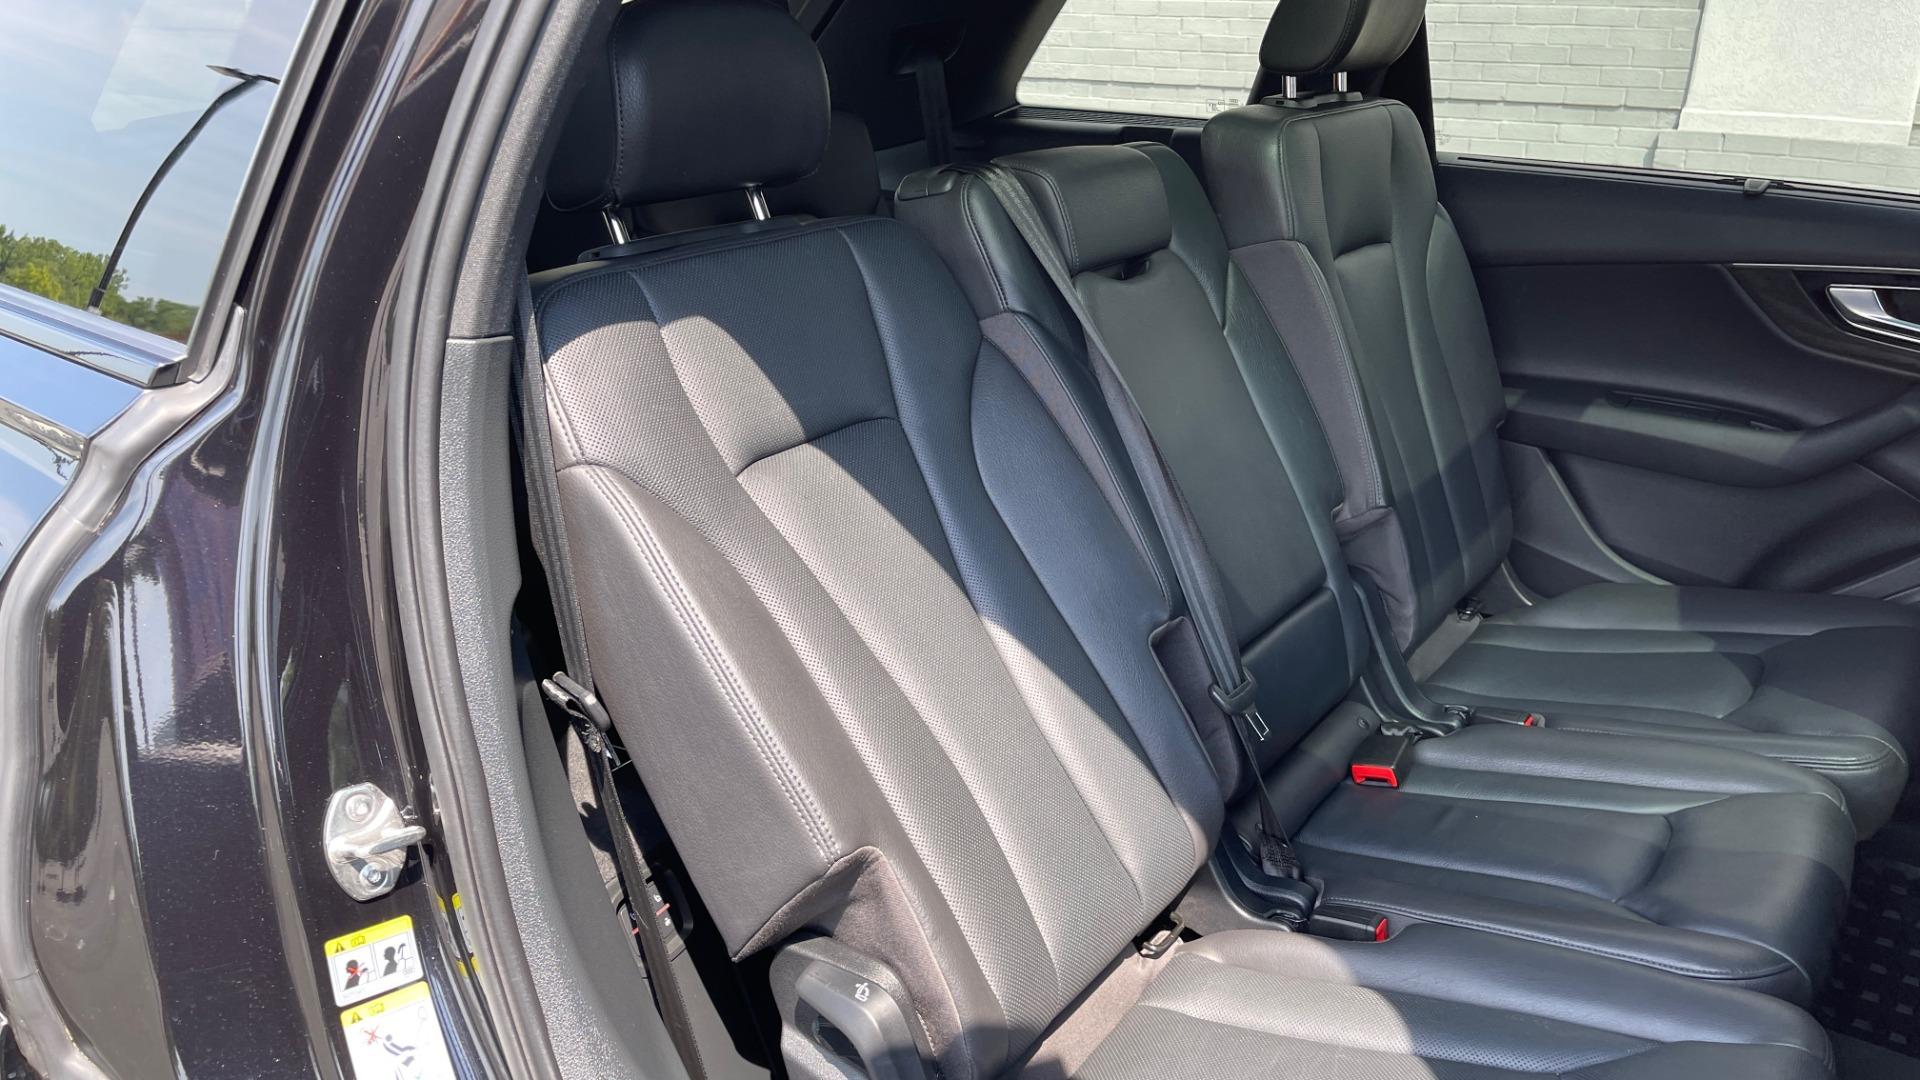 Used 2018 Audi Q7 PRESTIGE TIPTRONIC / NAV / SUNROOF / ADAPTIVE PKG / DRVR ASST / CLD WTHR /  for sale $49,995 at Formula Imports in Charlotte NC 28227 70